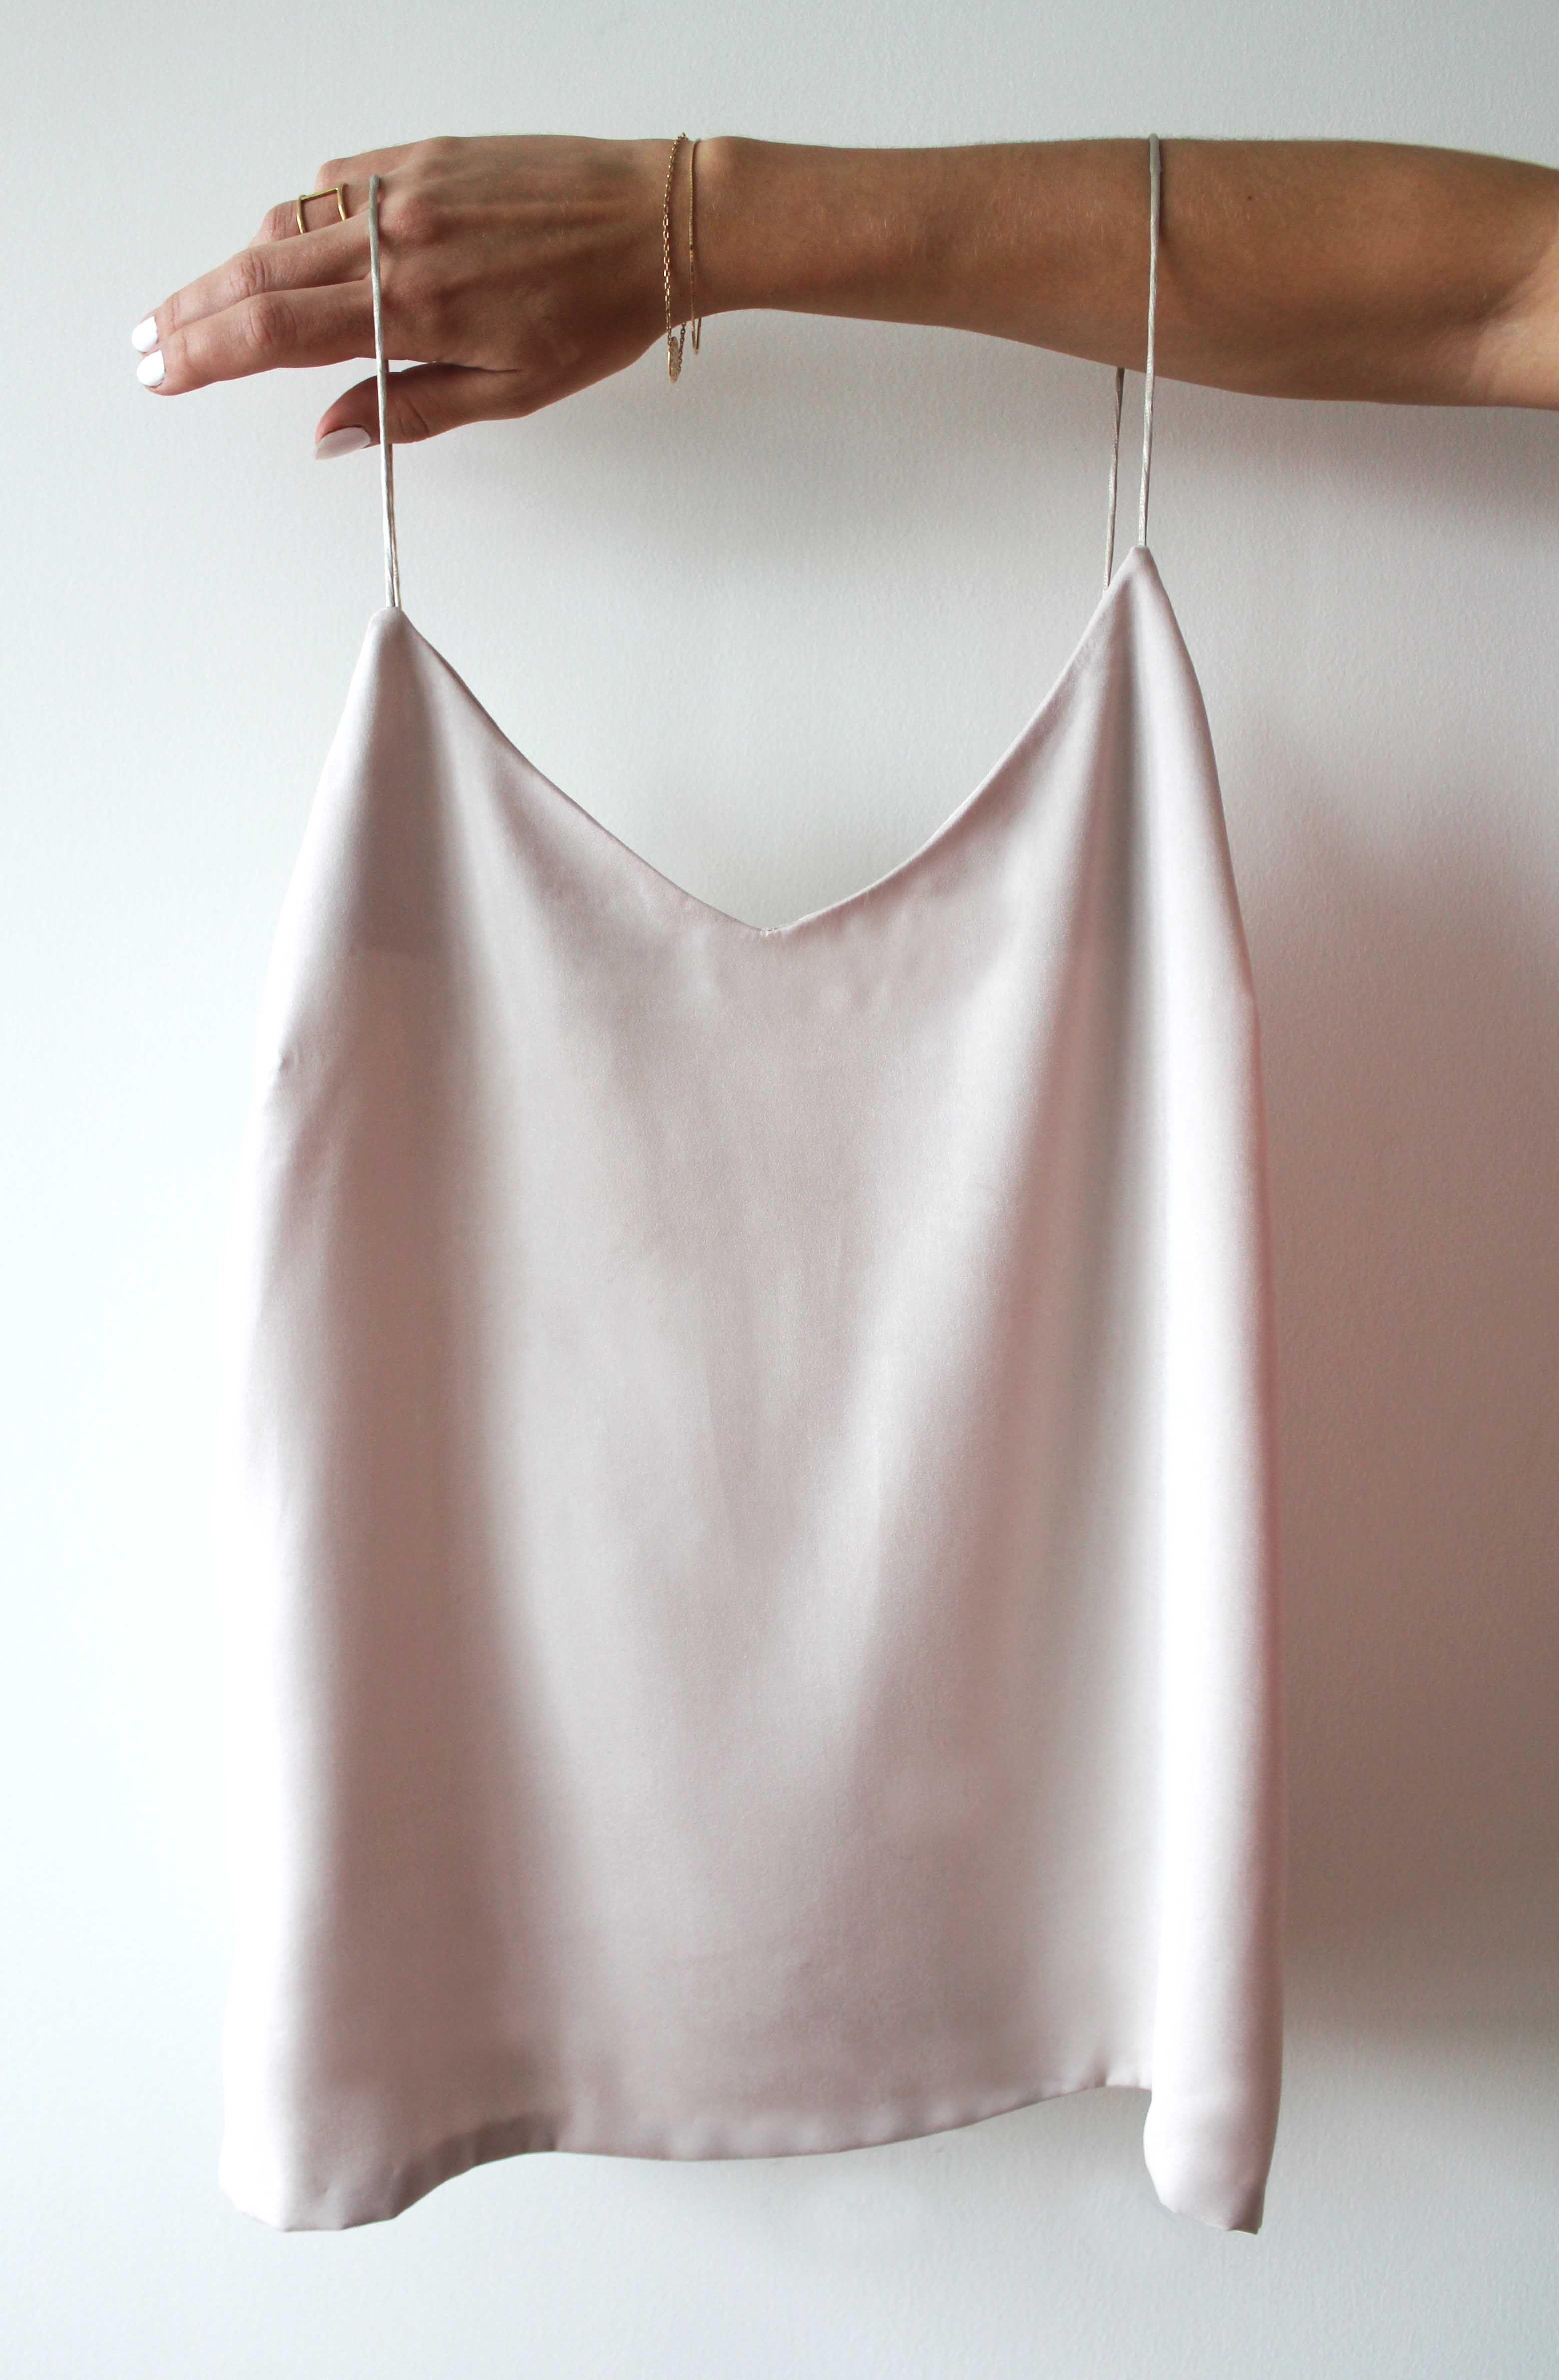 Wardrobe Staples: DIY V-Neck Strap Top | Contour Affair #thingstowear